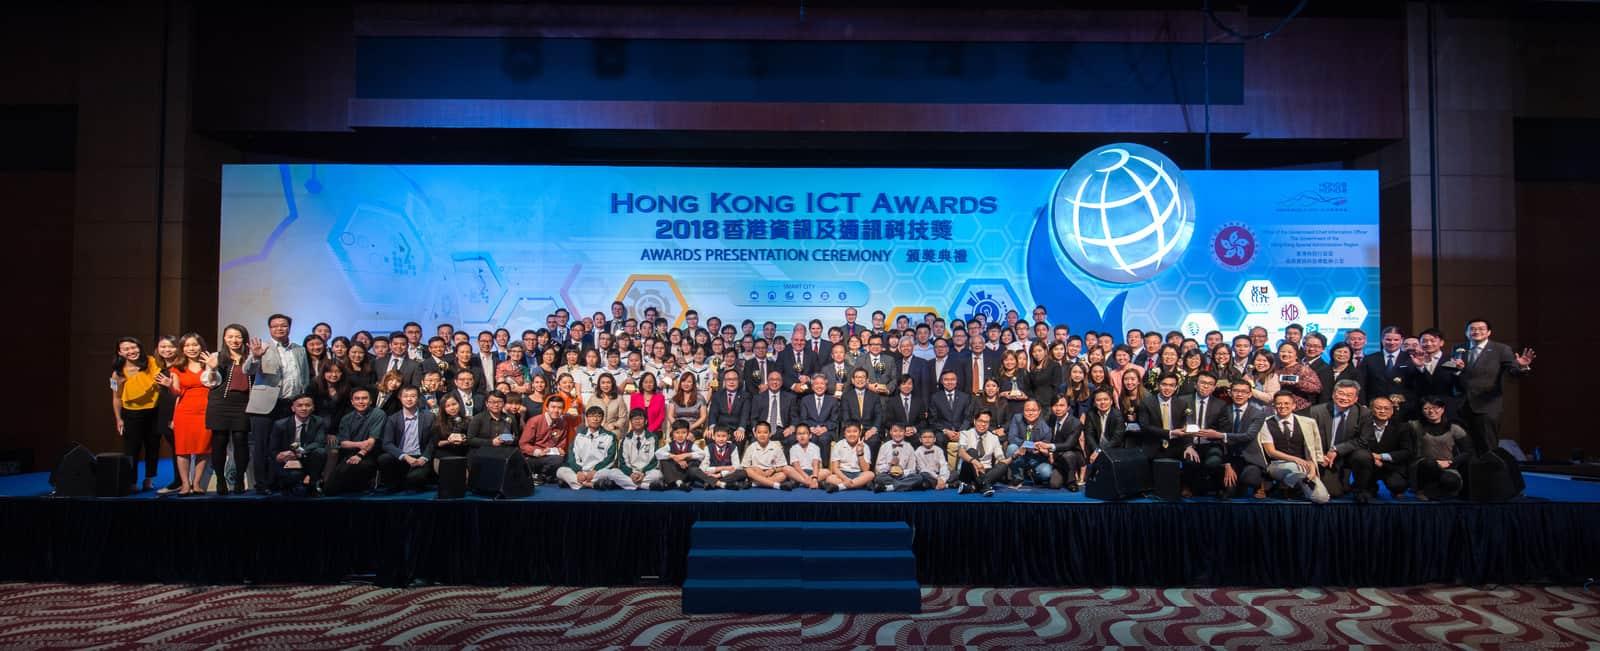 Hong Kong ICT Awards 2018 得獎專訪 (二) - 香港 unwire.hk